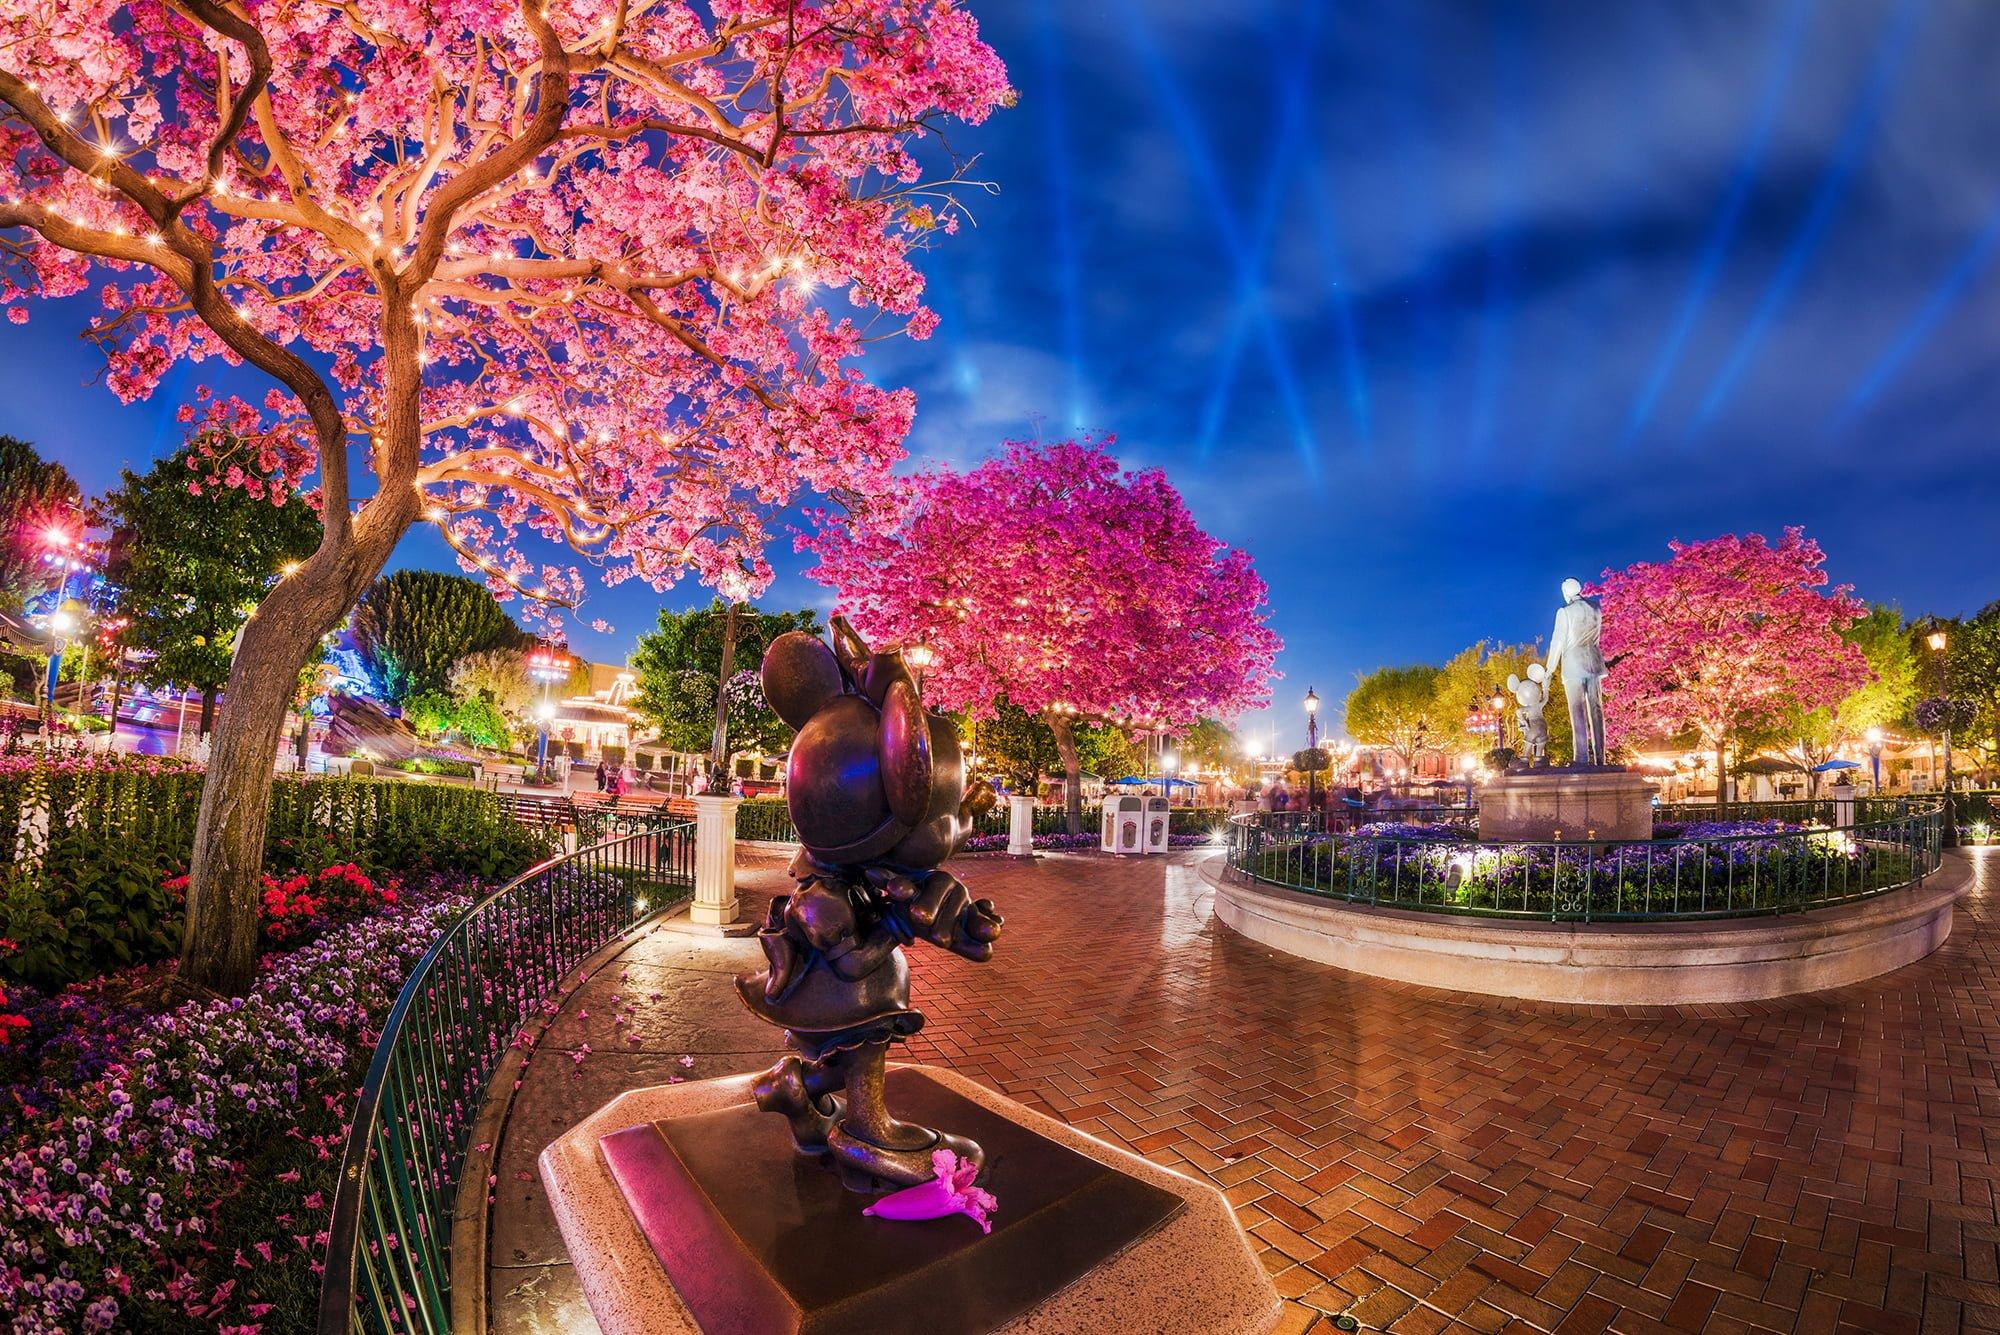 minnie-mouse-tabebuia-trees-blossoms-disneyland-night-bricker copy